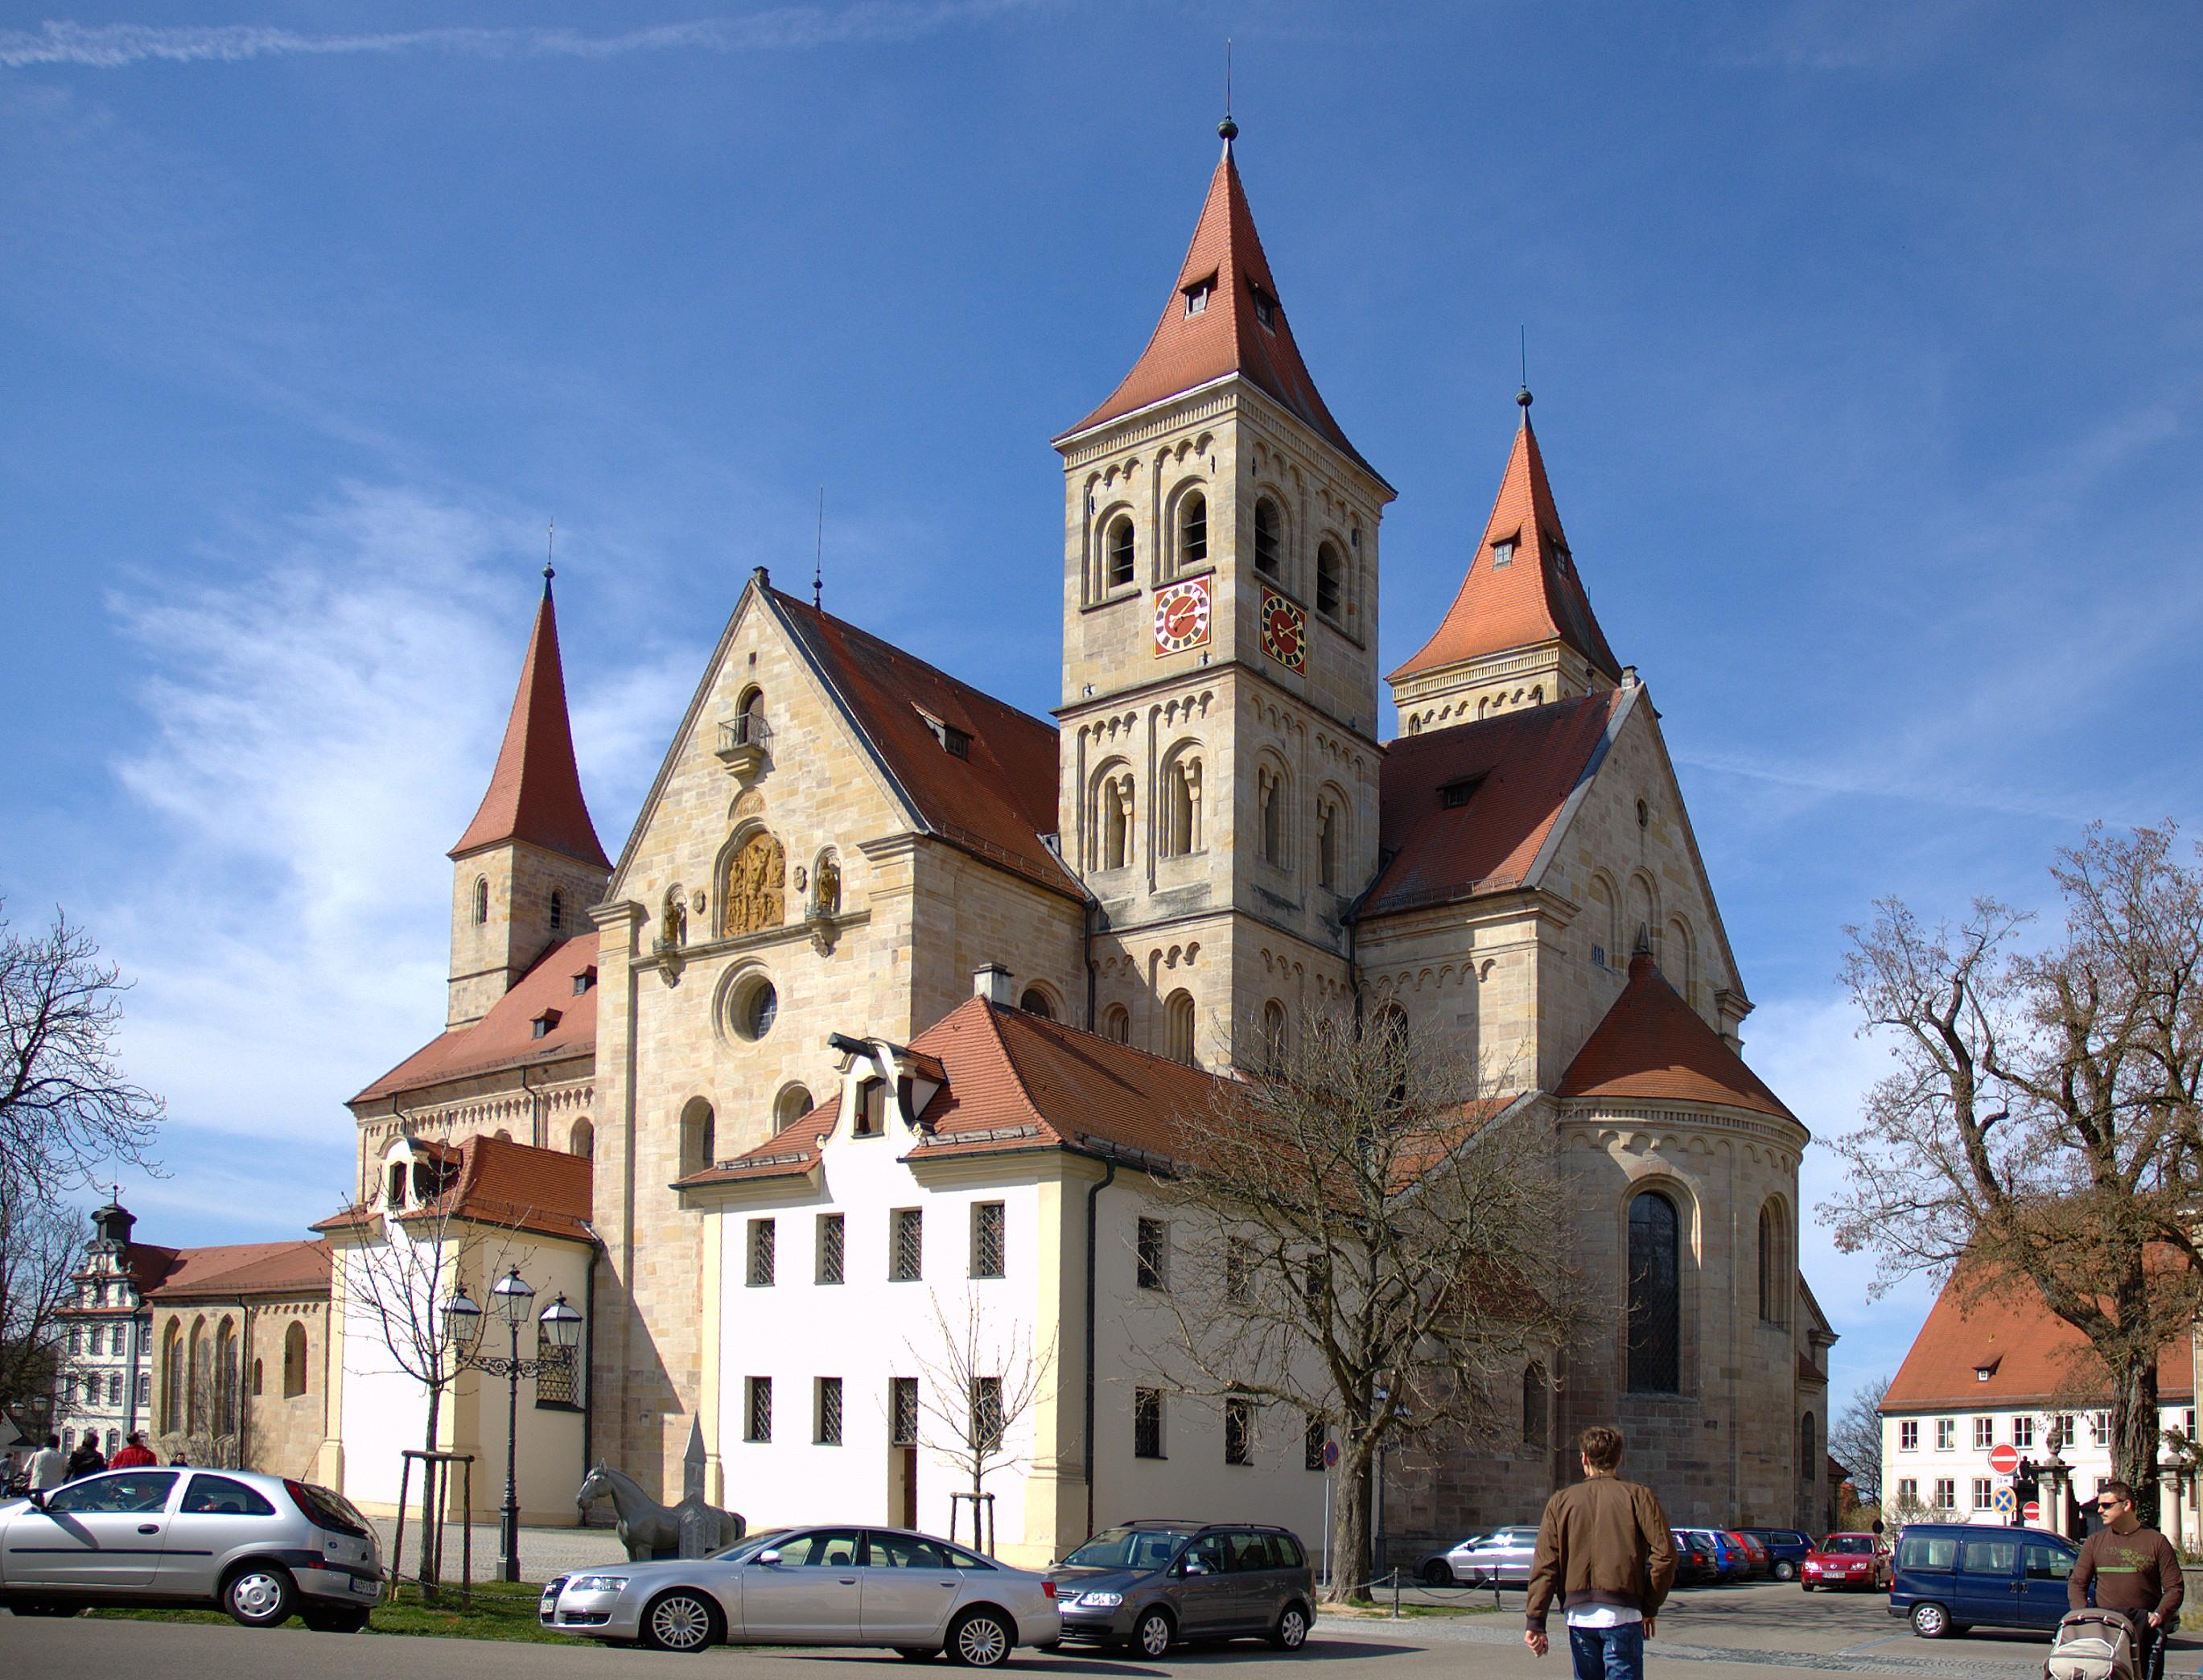 Ibis Hotel Passau Germany